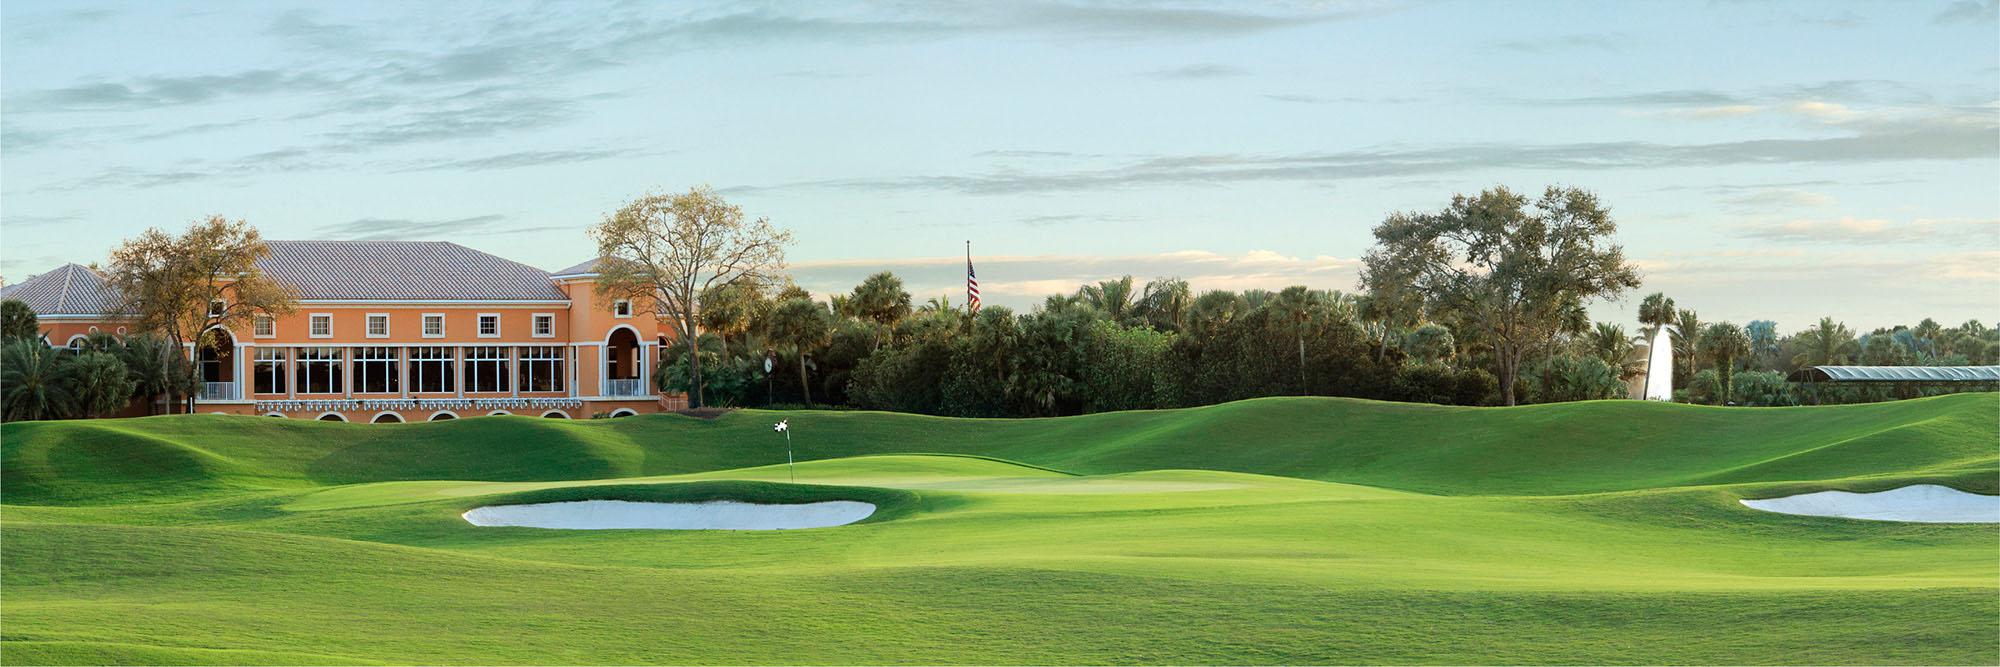 Golf Course Image - Mirasol Sunset No. 18